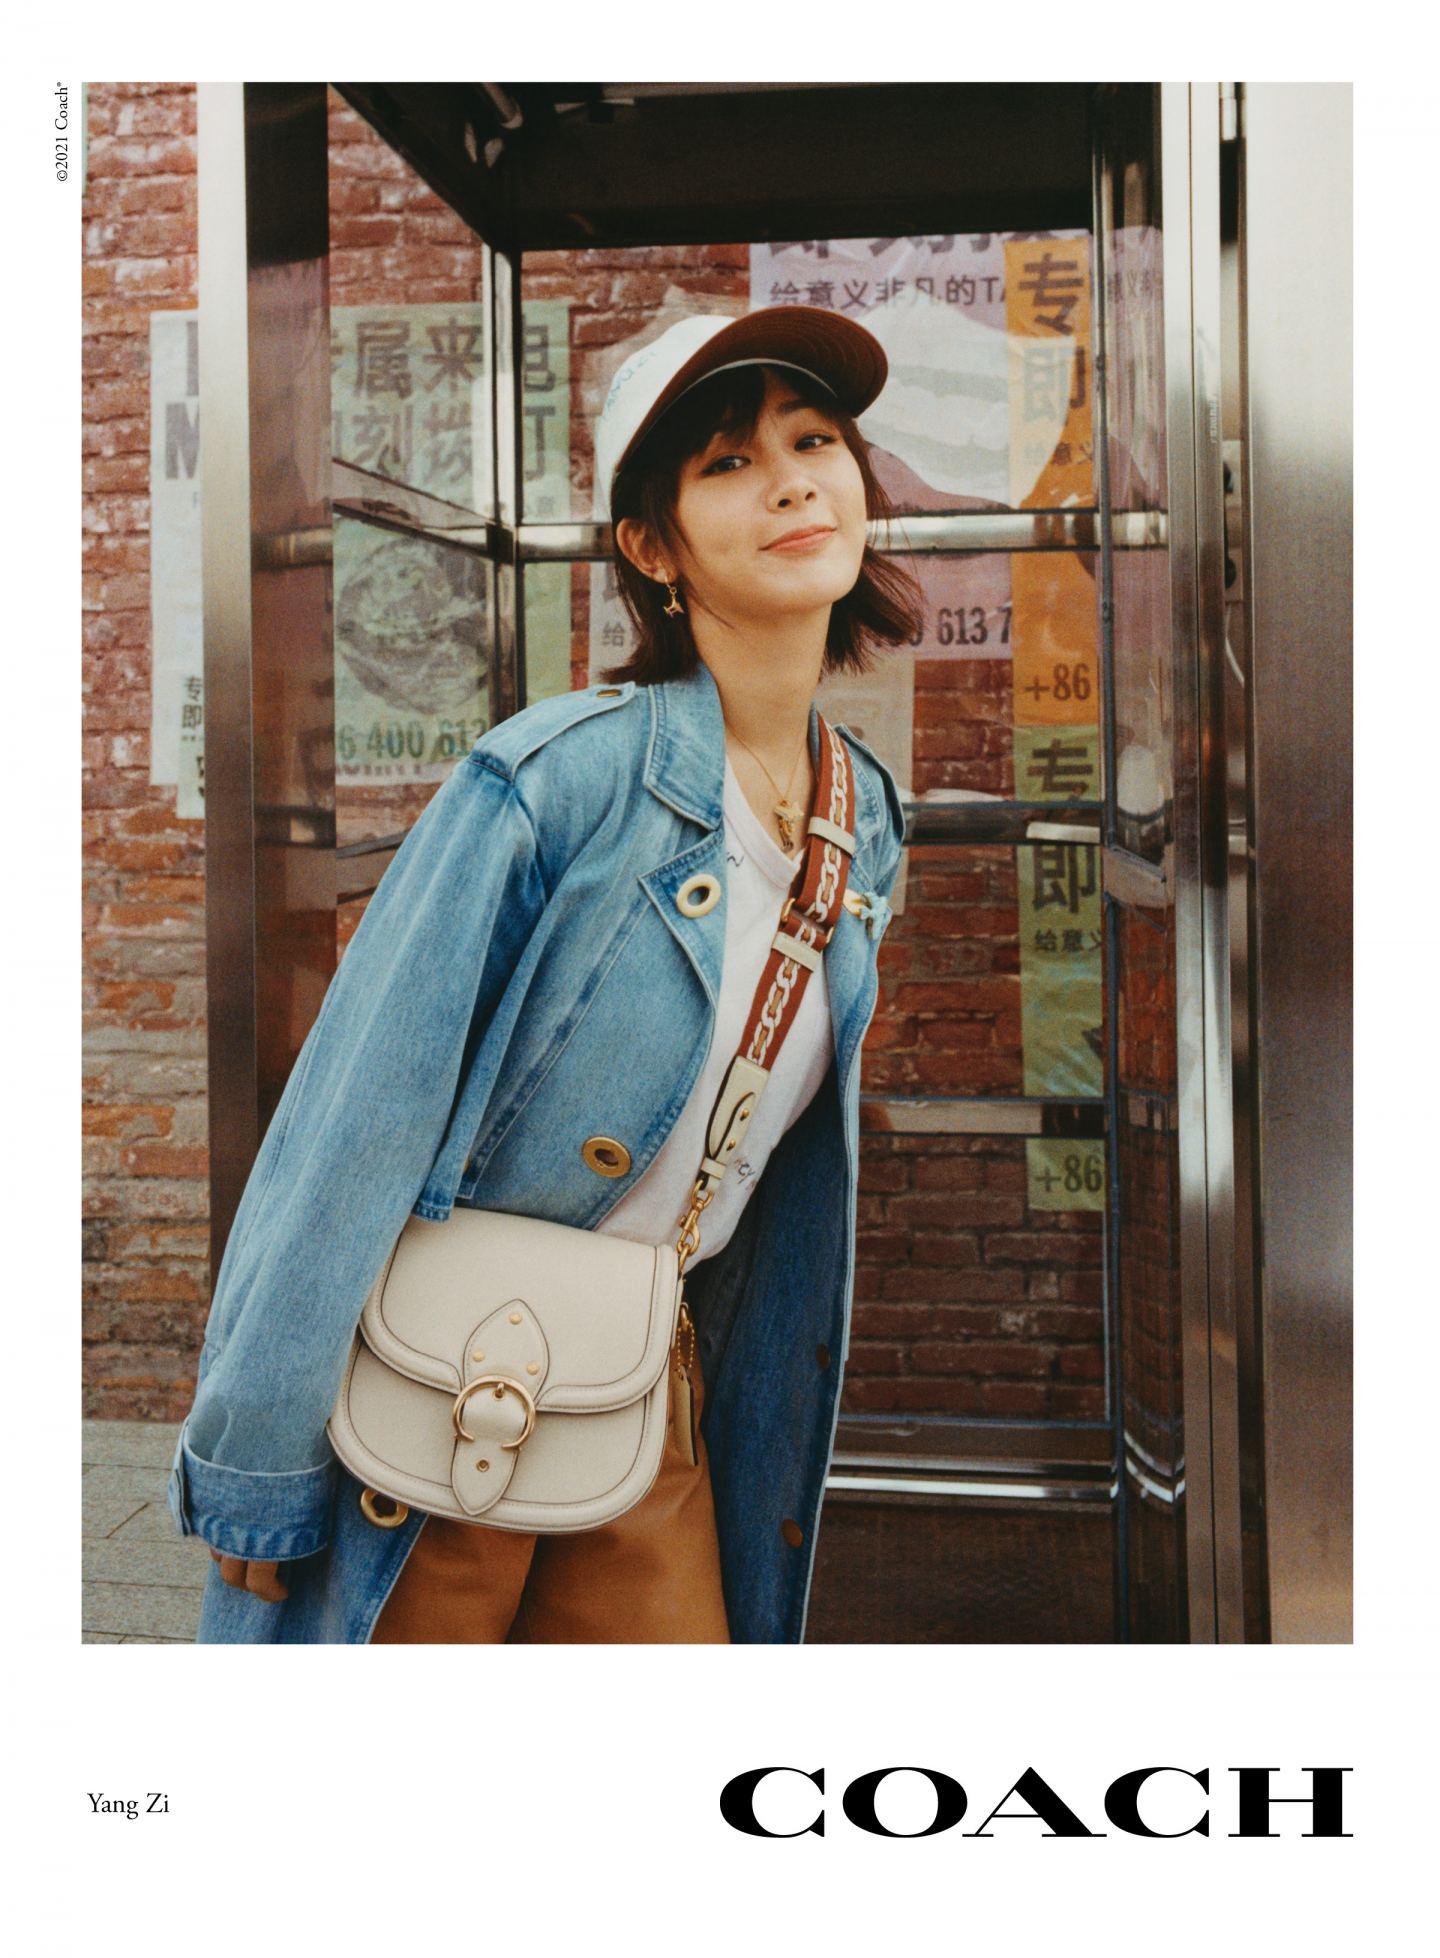 Yang Zi_ coach bag bags handbag